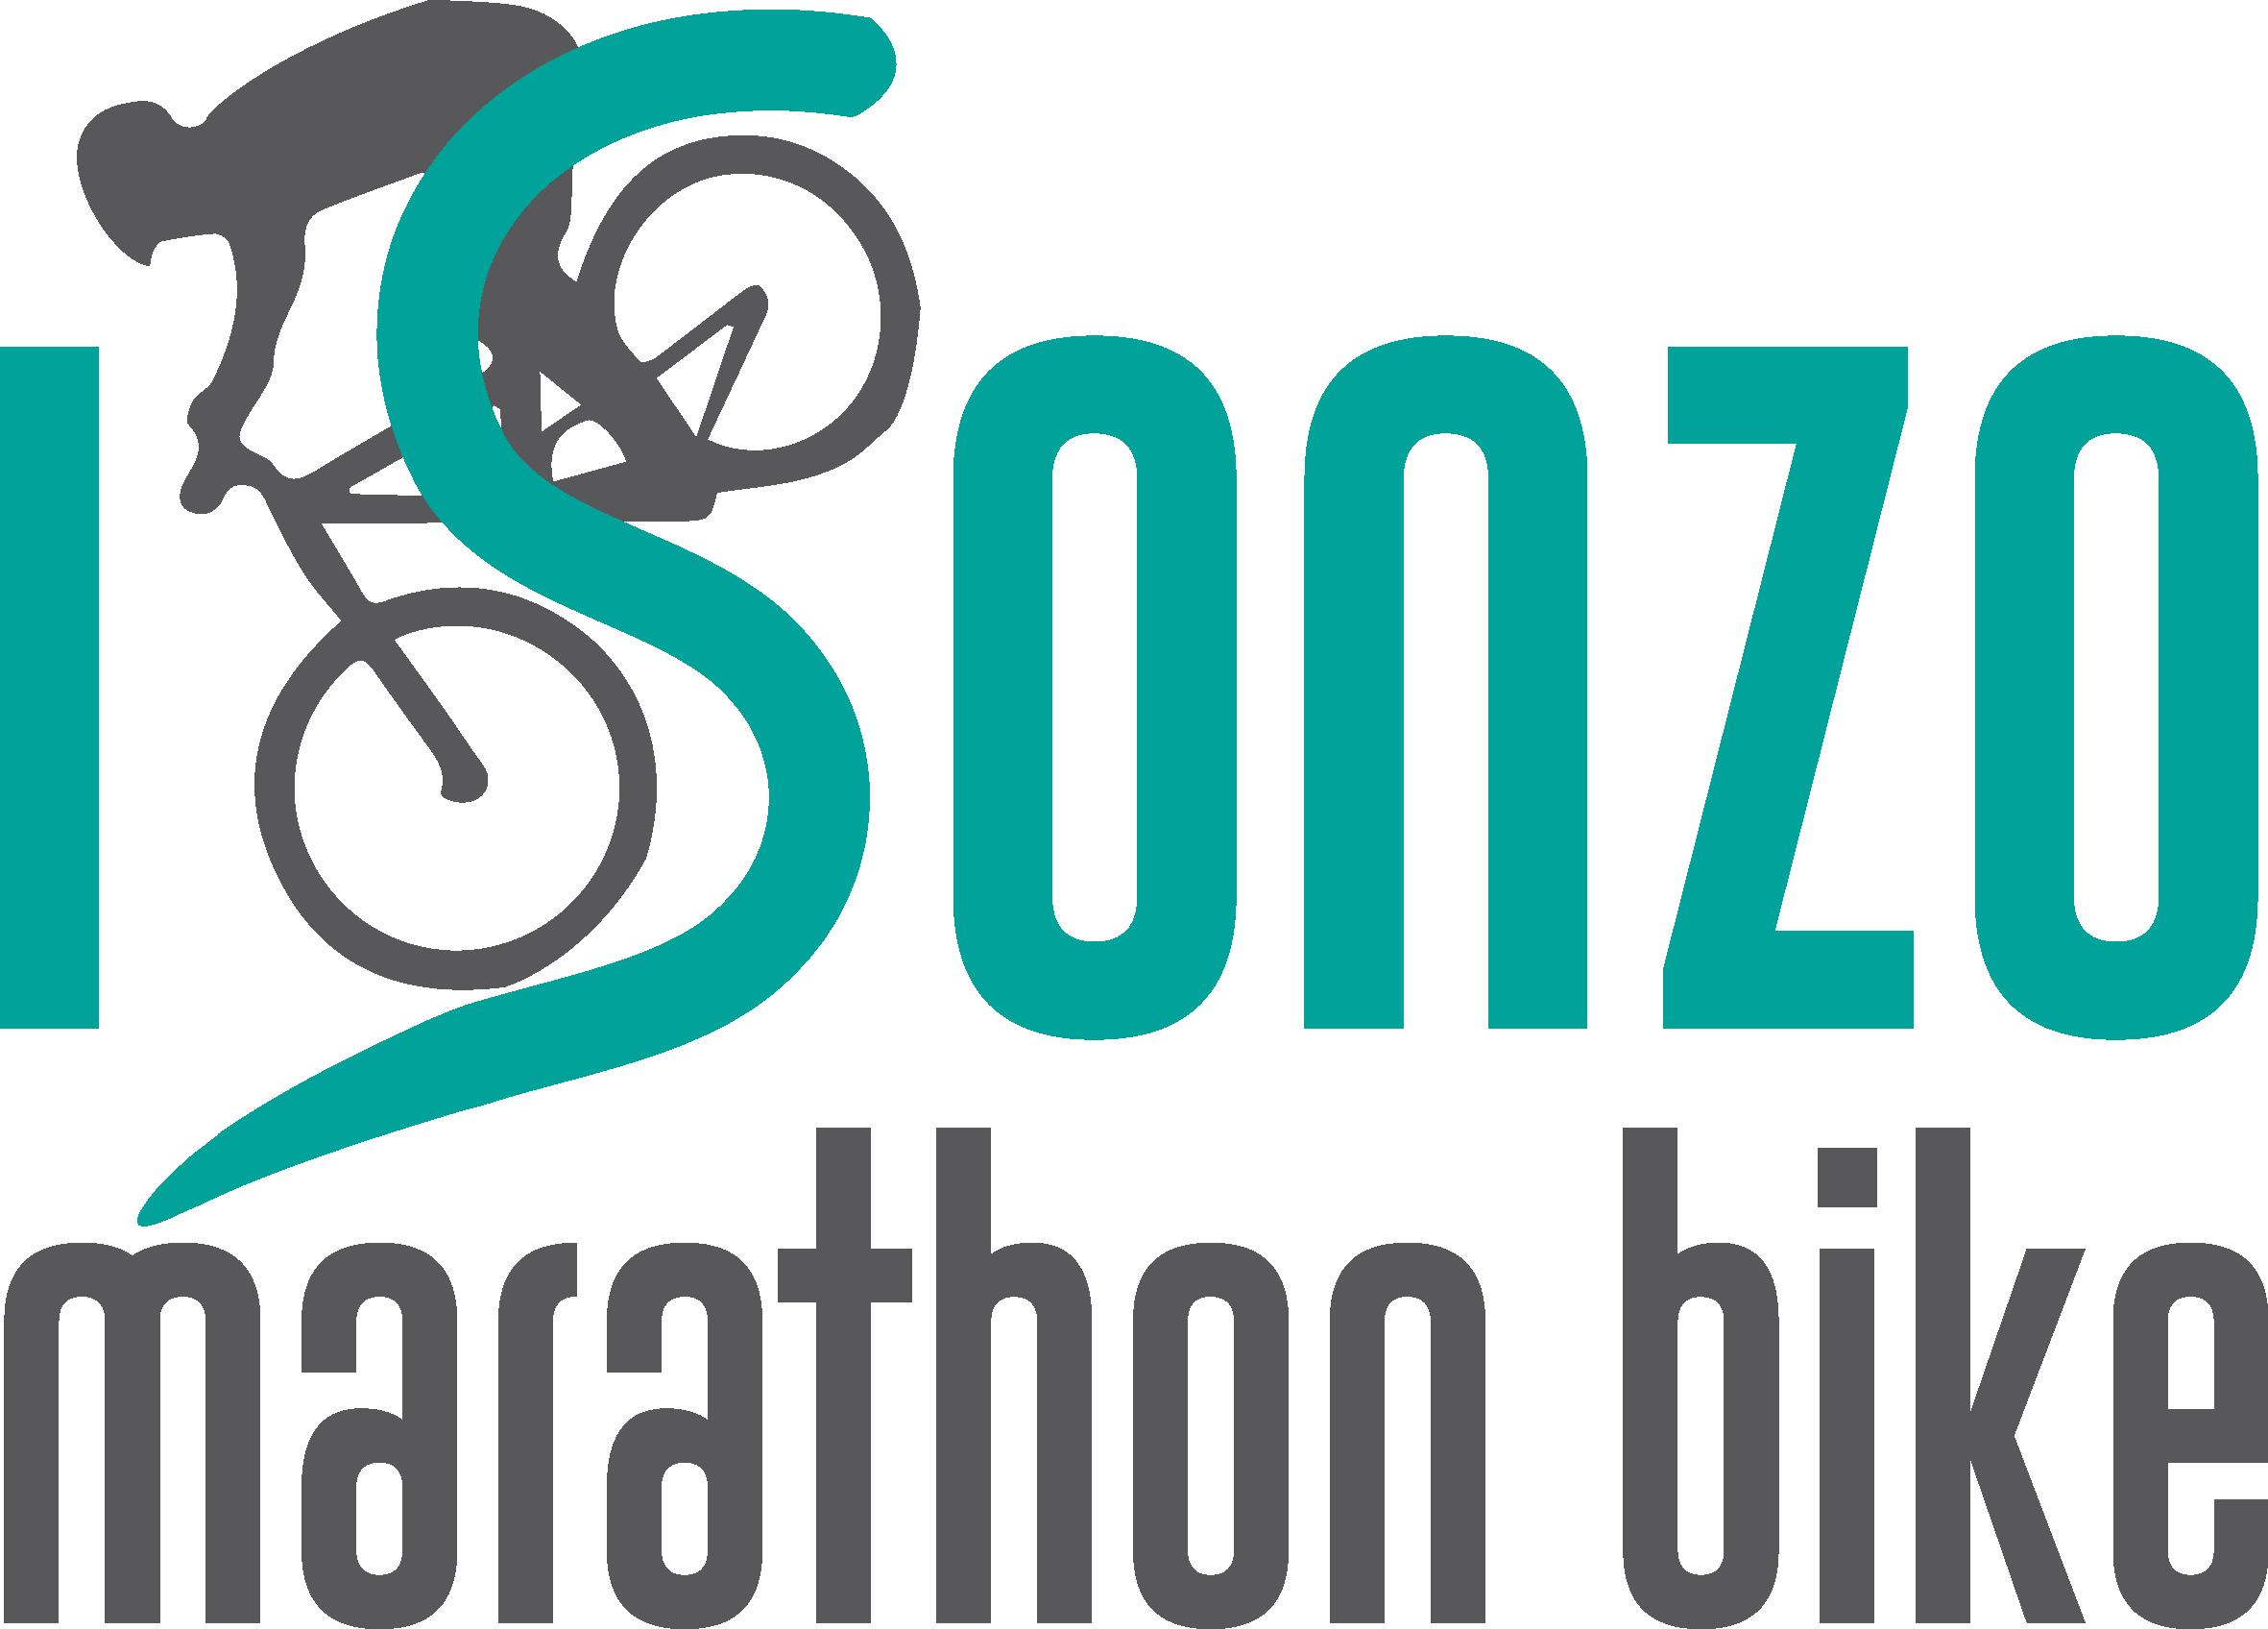 http://www.bikeandrungorizia.it/wp-content/uploads/2021/03/IMB.png